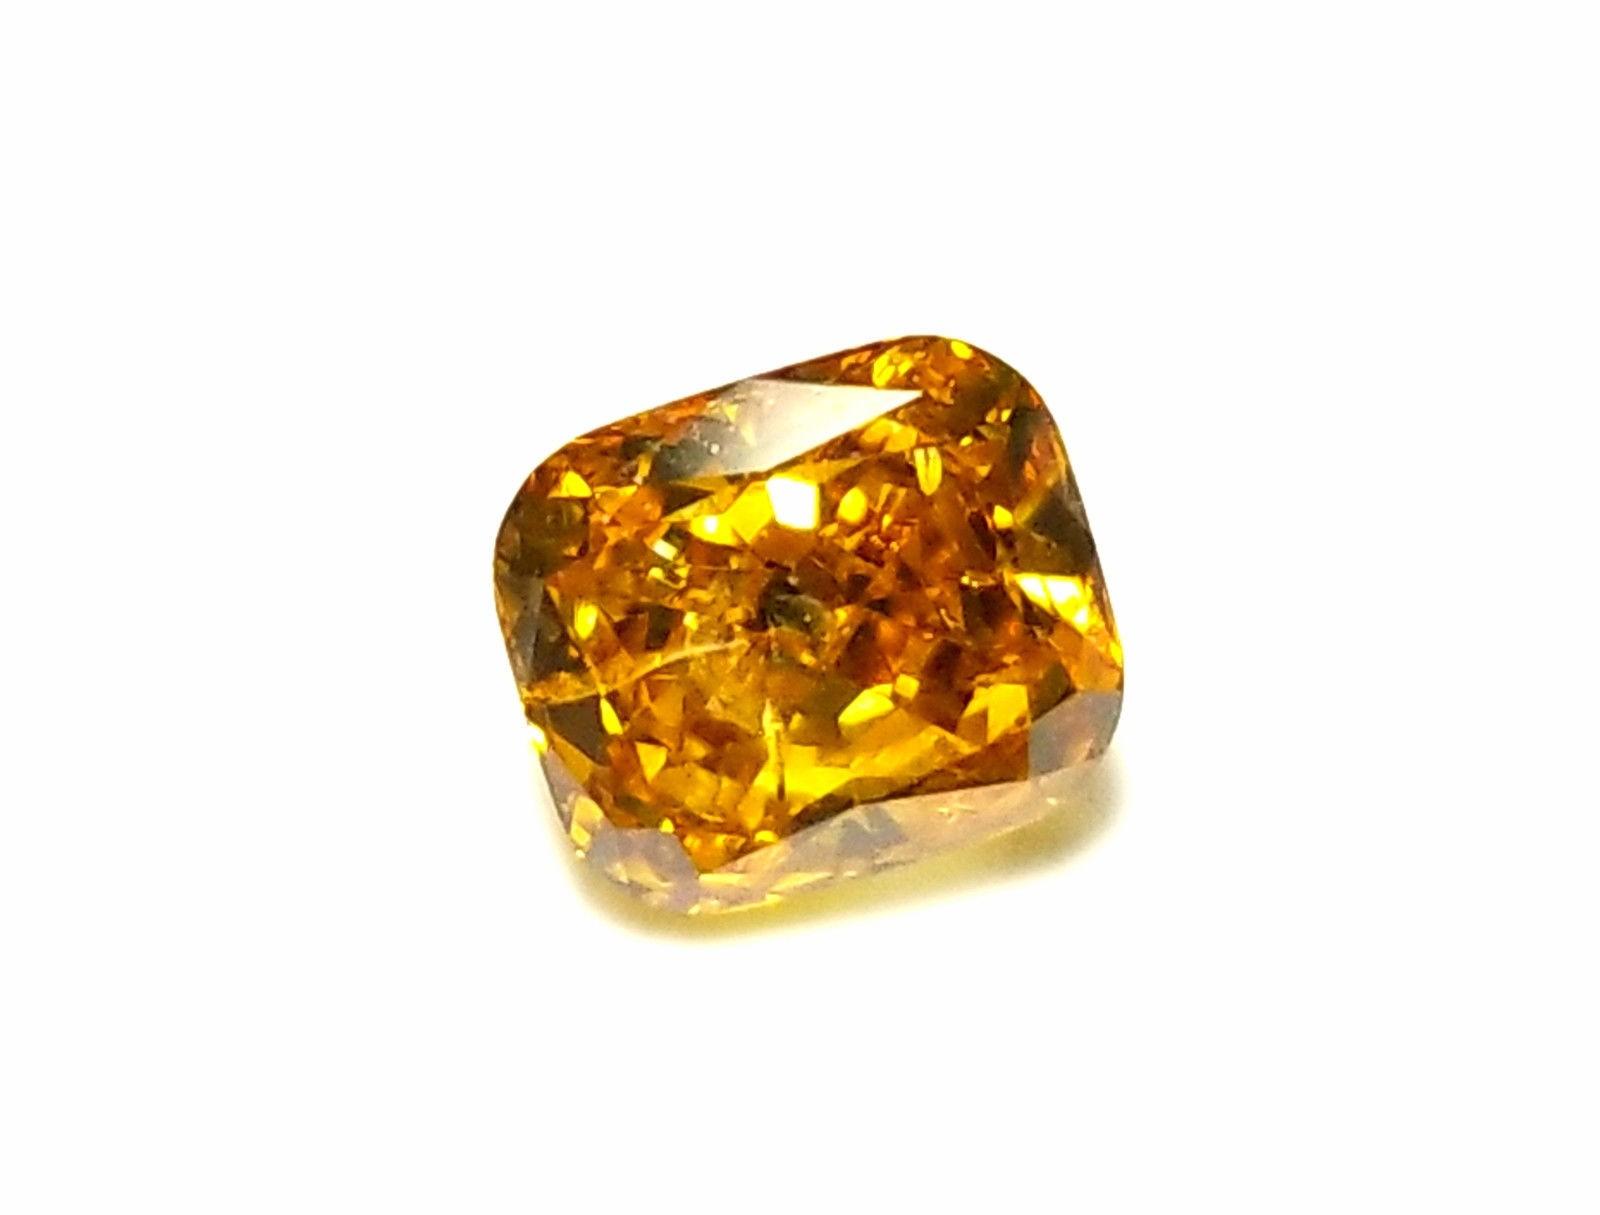 923aa79b34 57 15 - 1.02ct Orange Diamond - Natural Loose Fancy Deep Orange Yellow GIA  Cushion